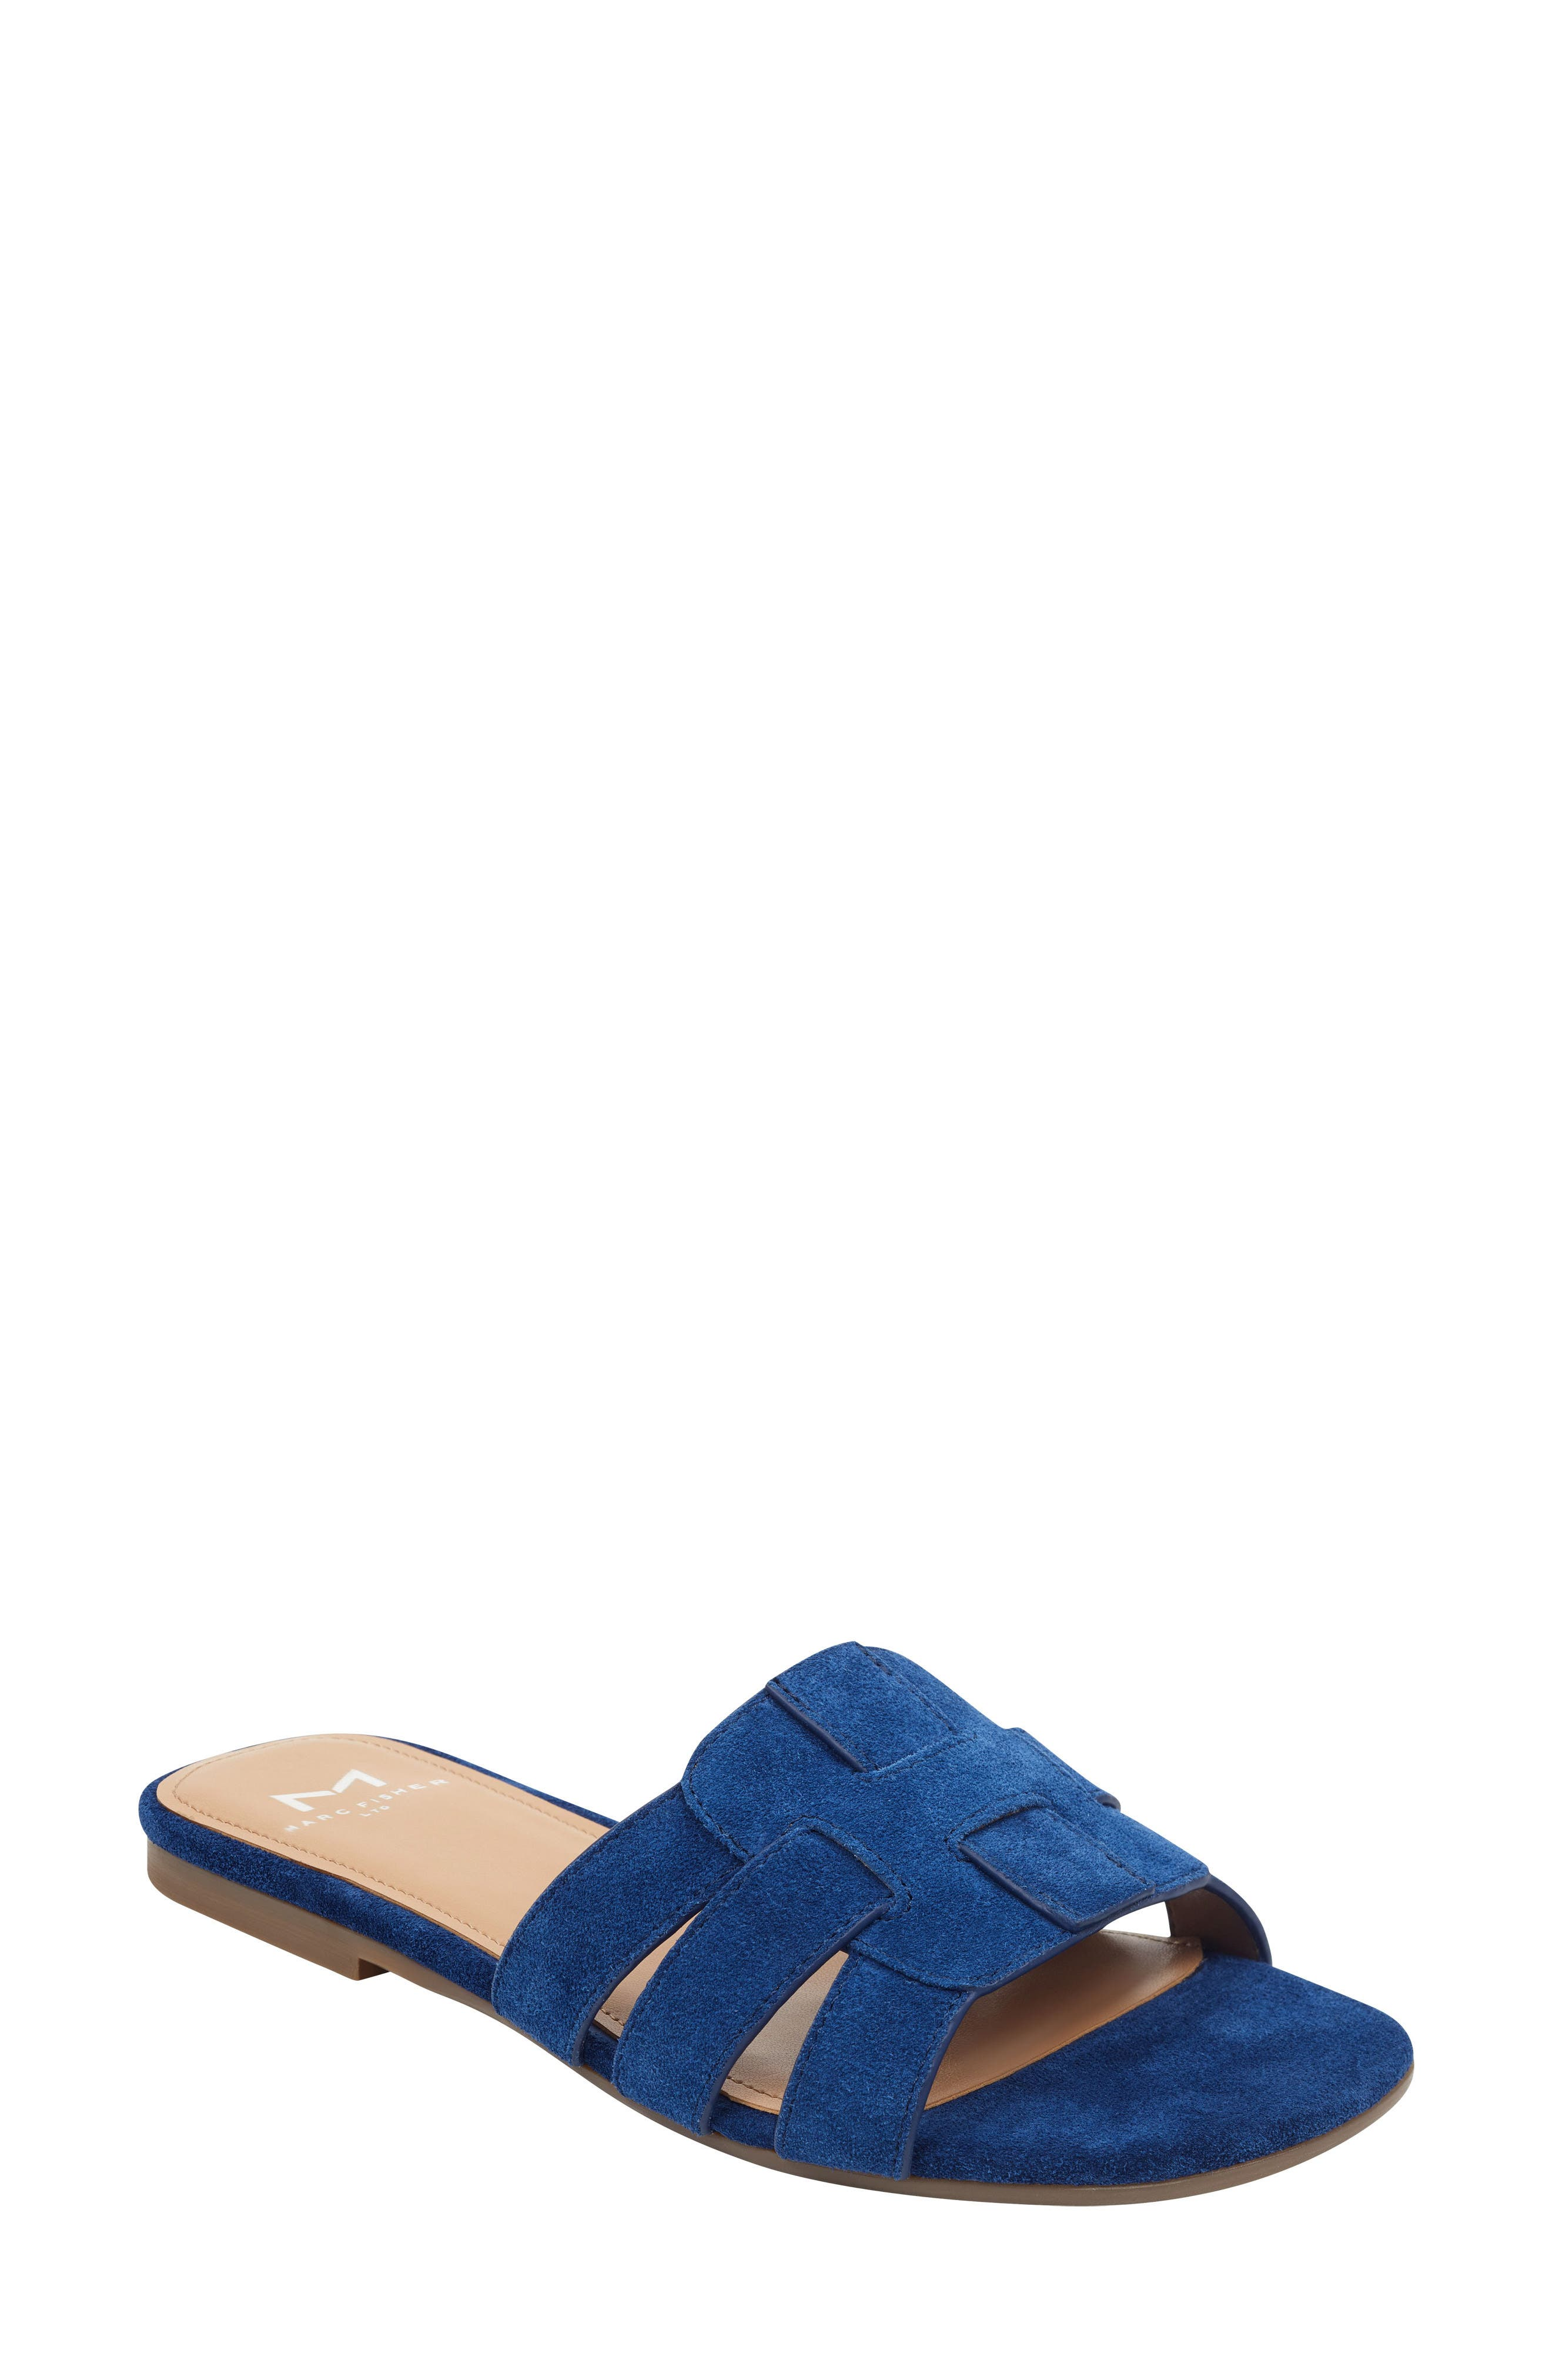 Marc Fisher Ltd Kayli Slide Sandal- Blue